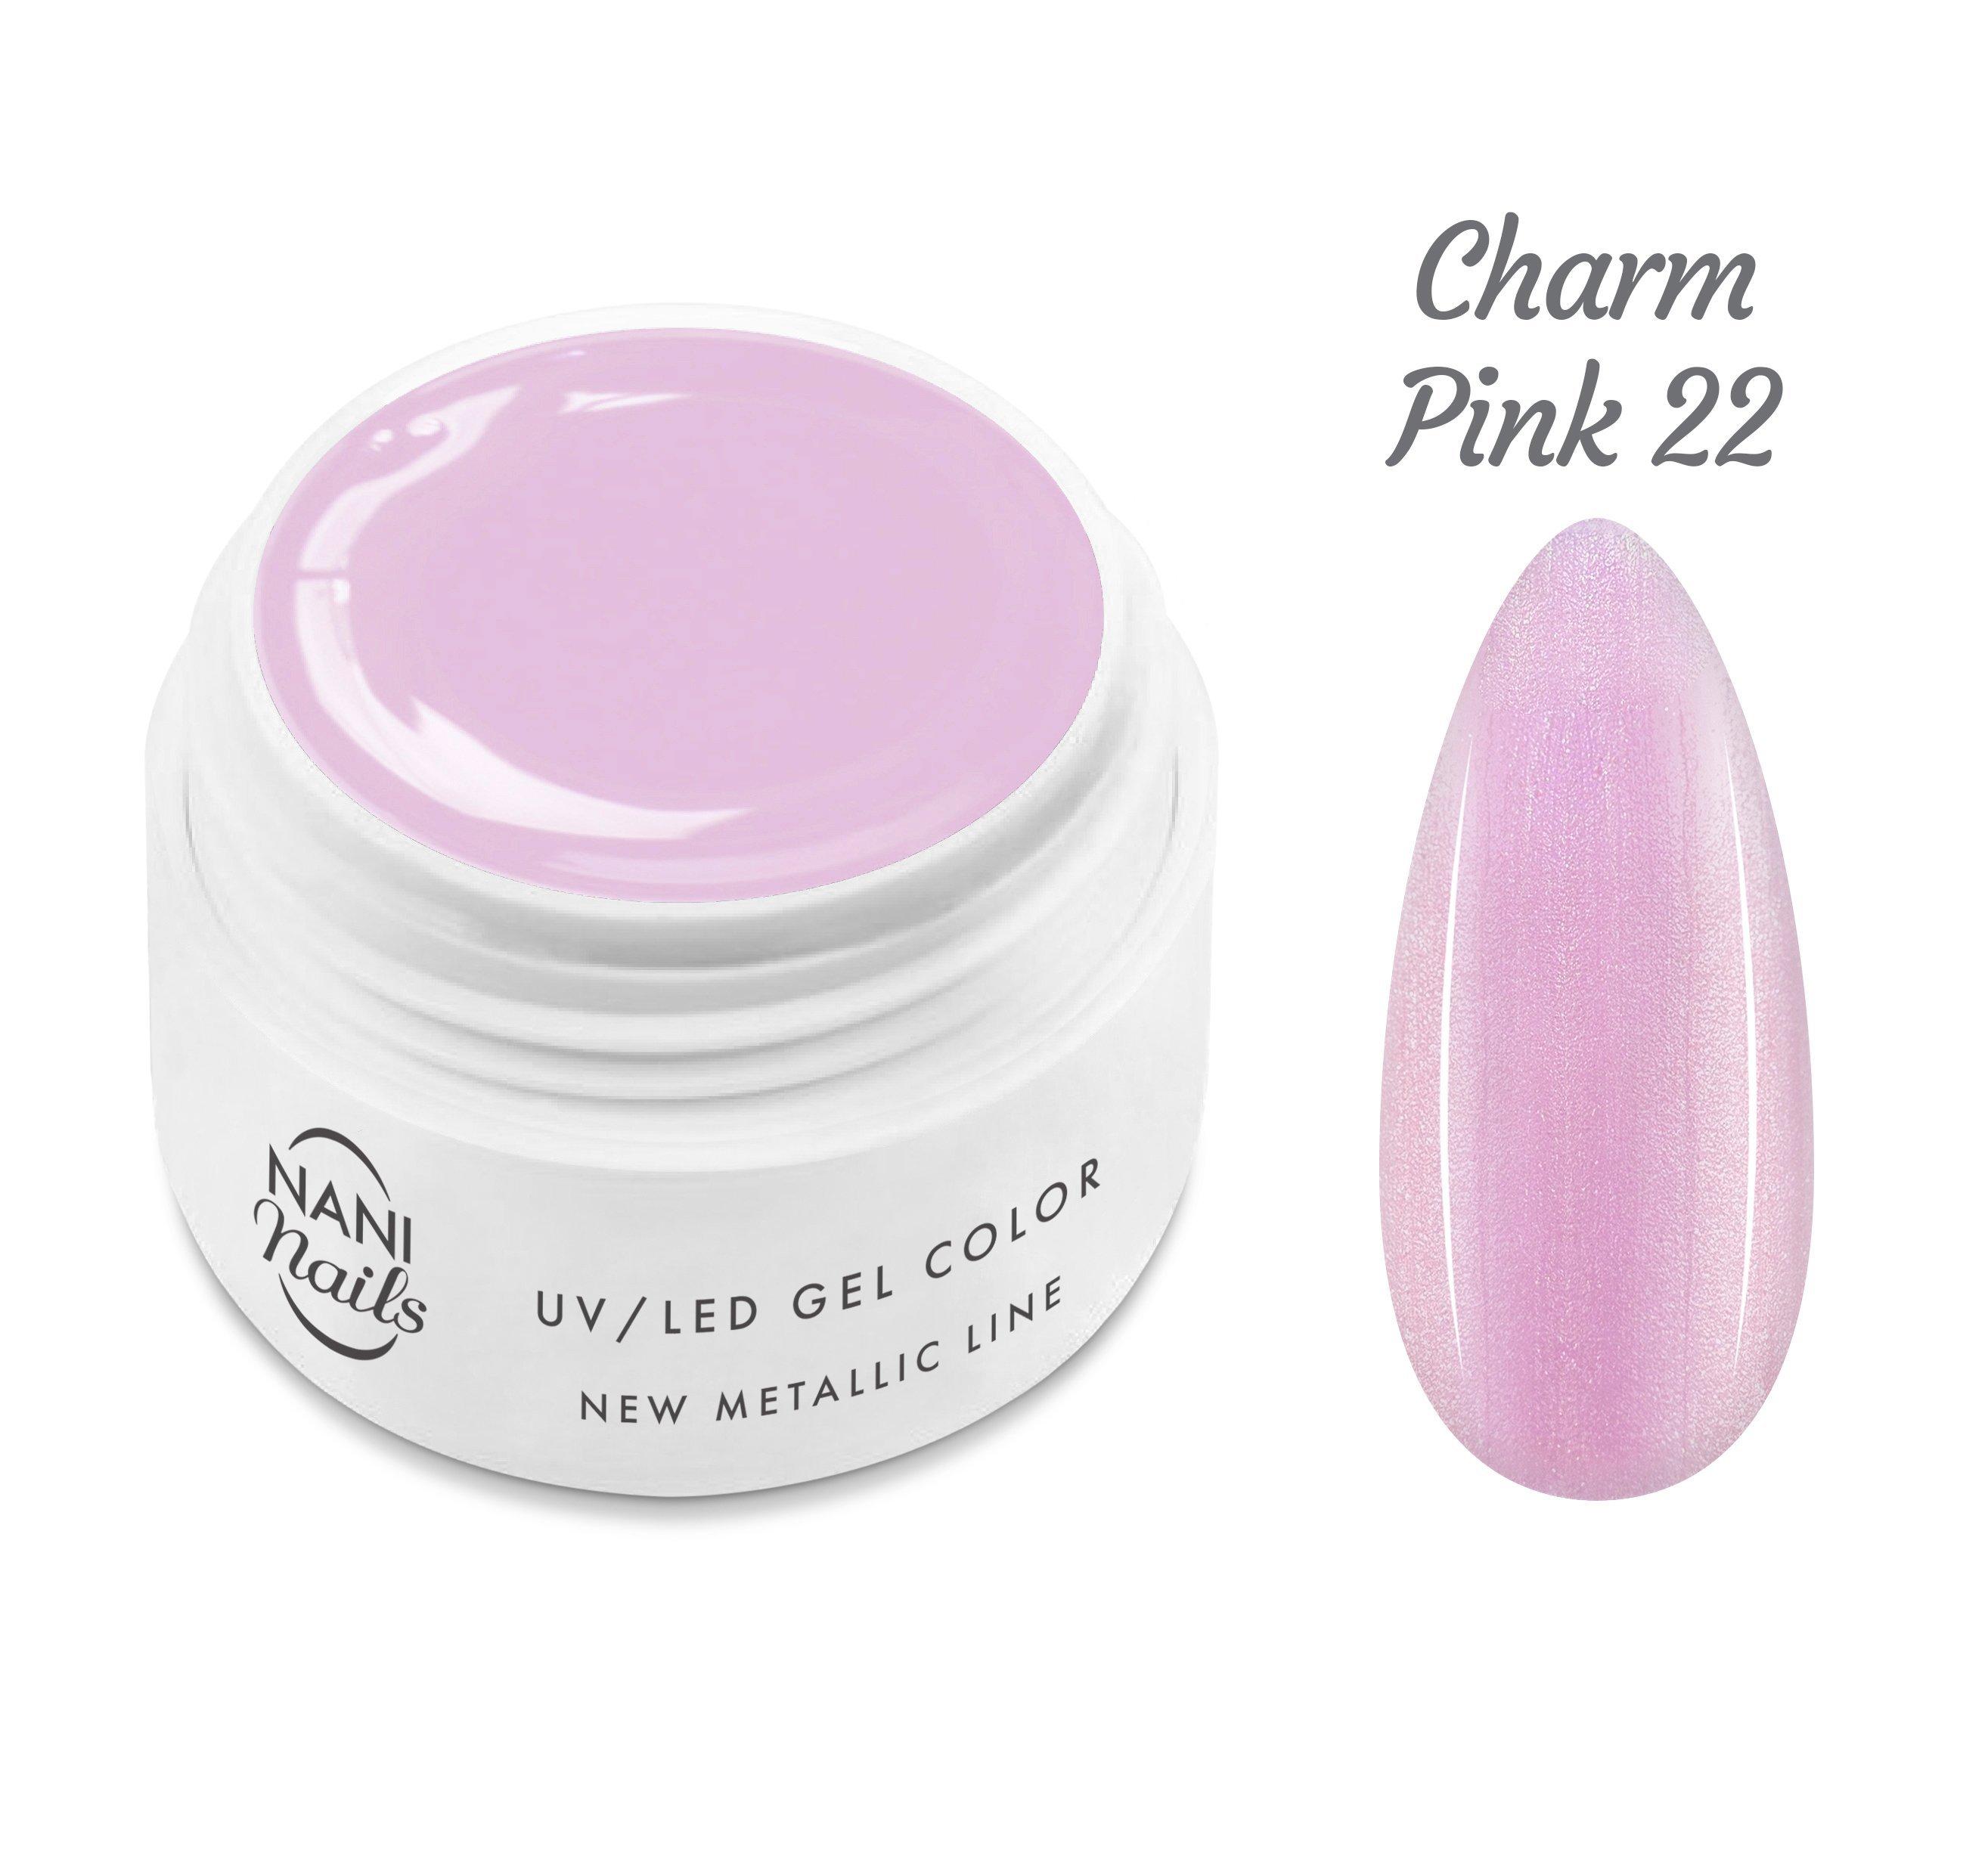 NANI UV gél New Metallic Line 5 ml - Charm Pink